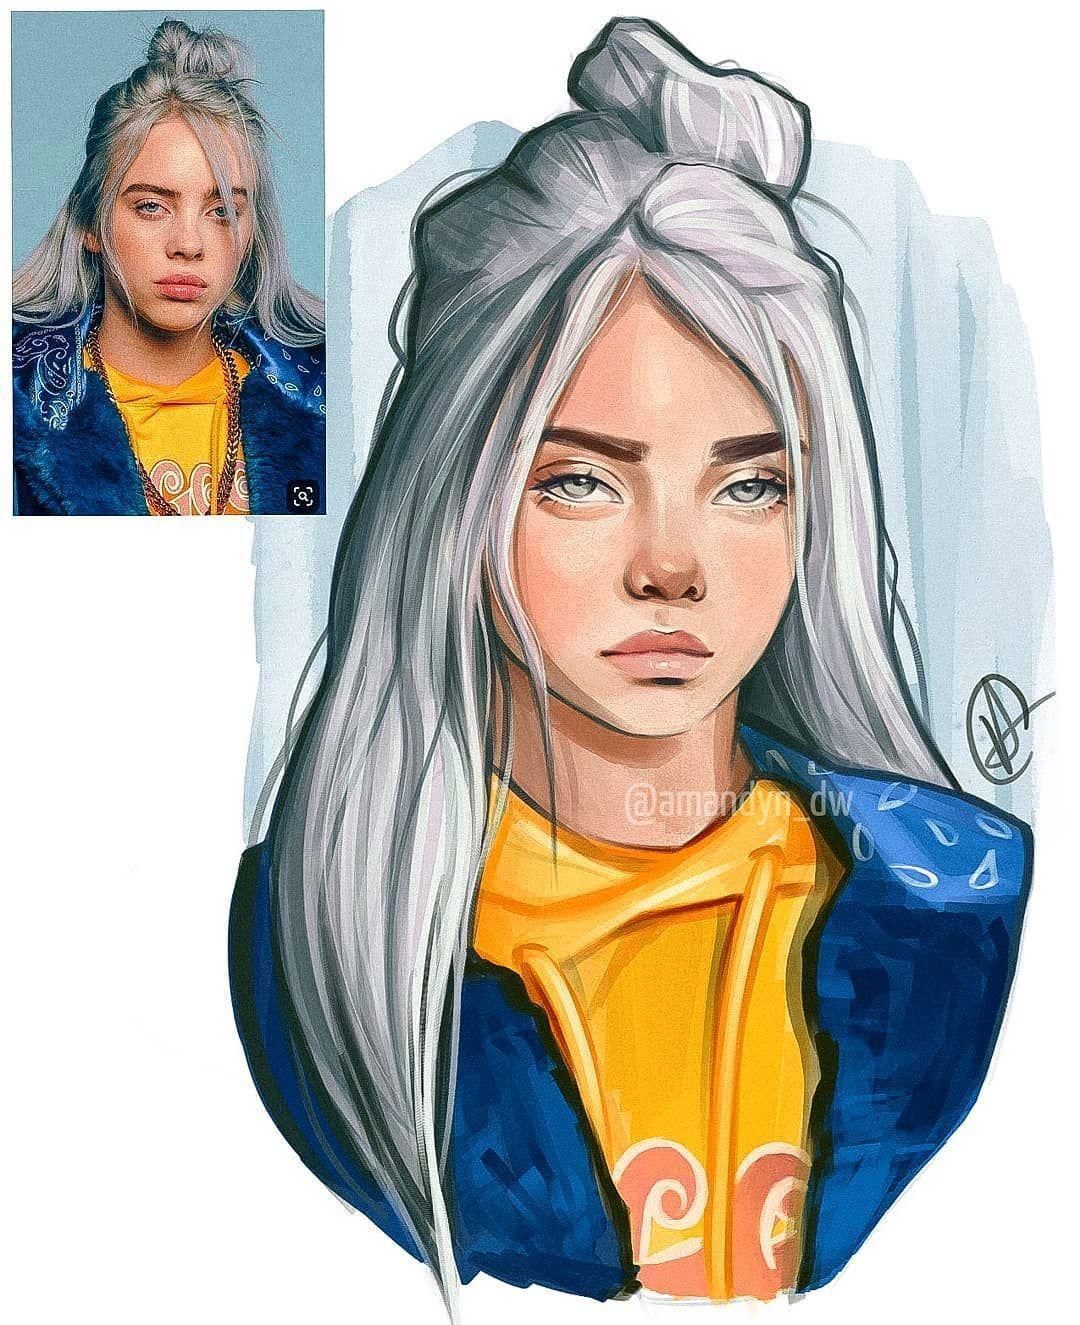 Amandyn On Instagram My Portrait Of Billie Eilish Made With Procreate I Try To Make In 2020 Celebrity Drawings Billie Eilish Portrait